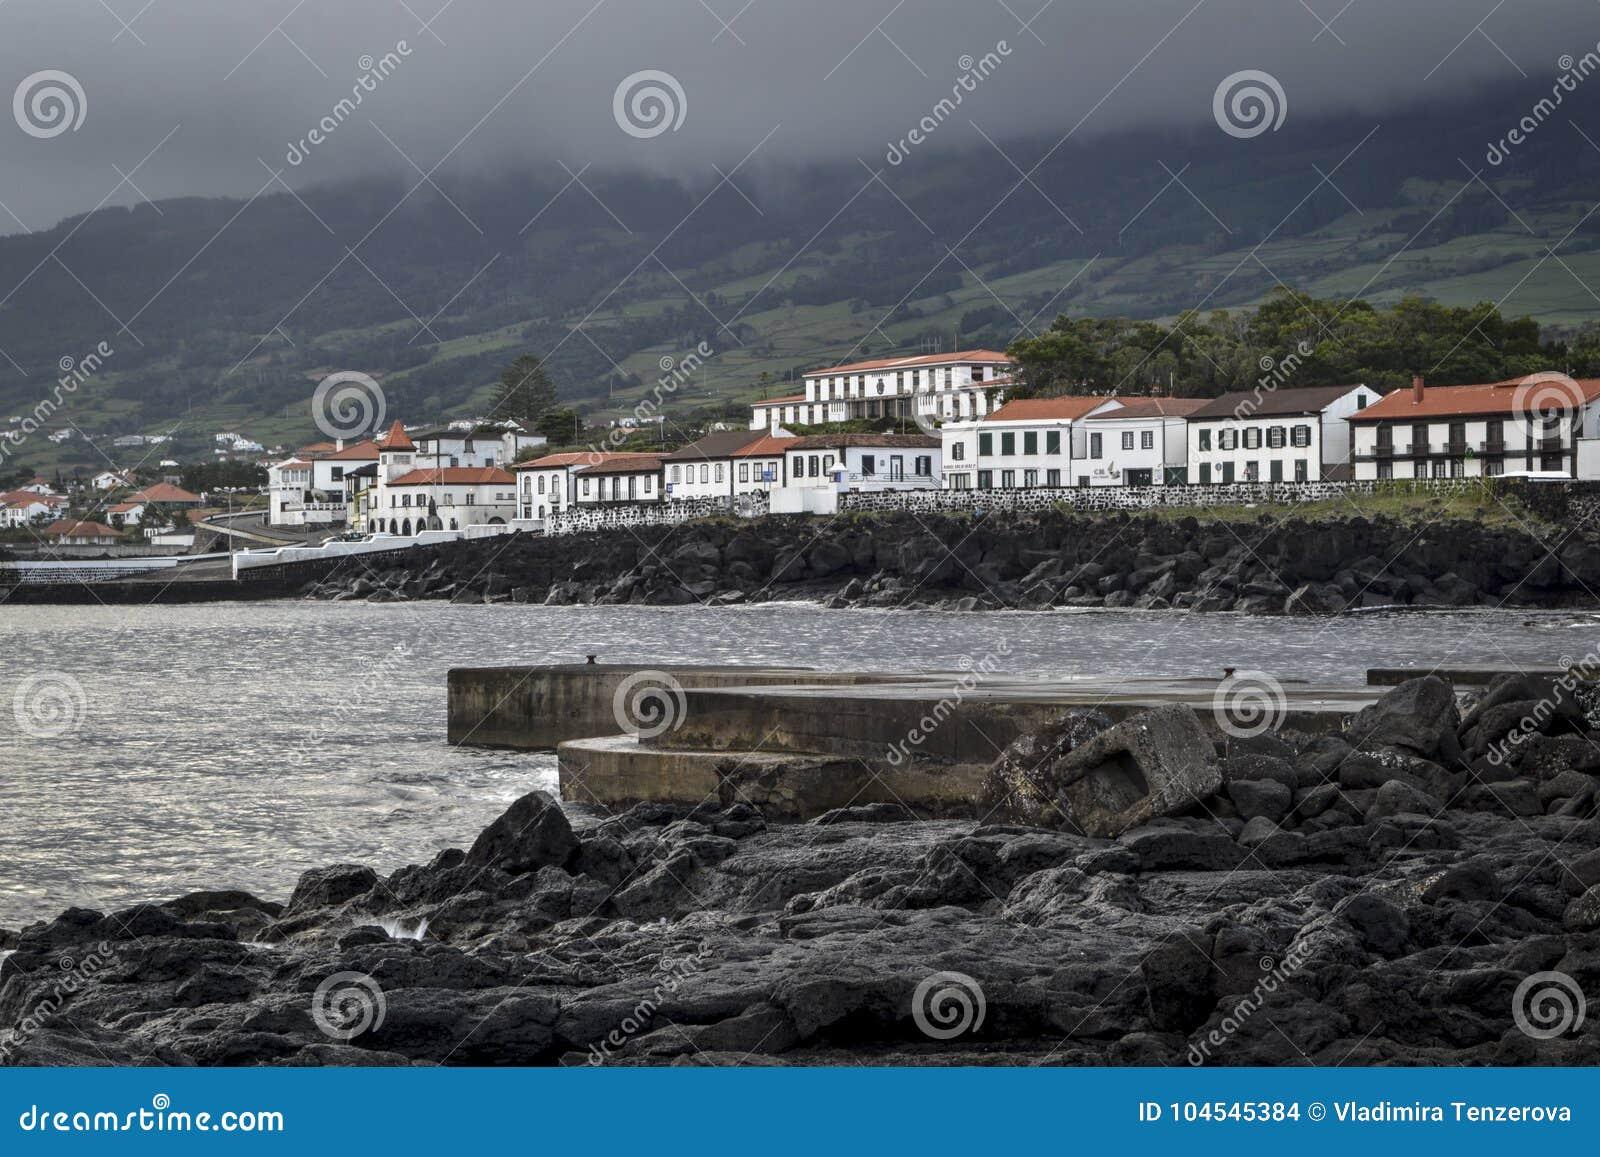 Lava rocky coastline with the original white harbor houses at sunrise on the island of Pico